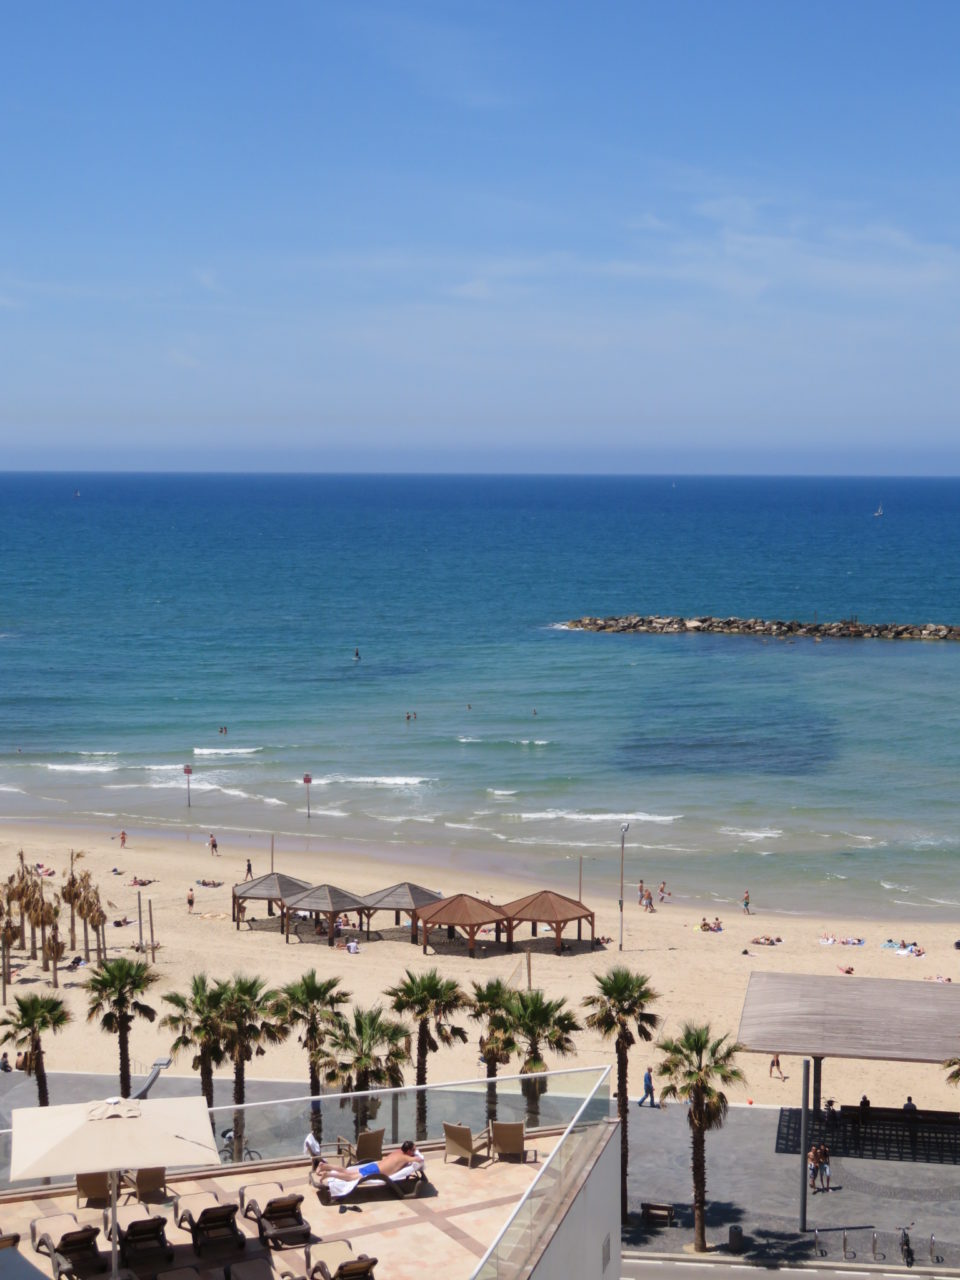 Vacationing in Israel ... The Tel Aviv Beach viewed from the Dan Tel Aviv Hotel